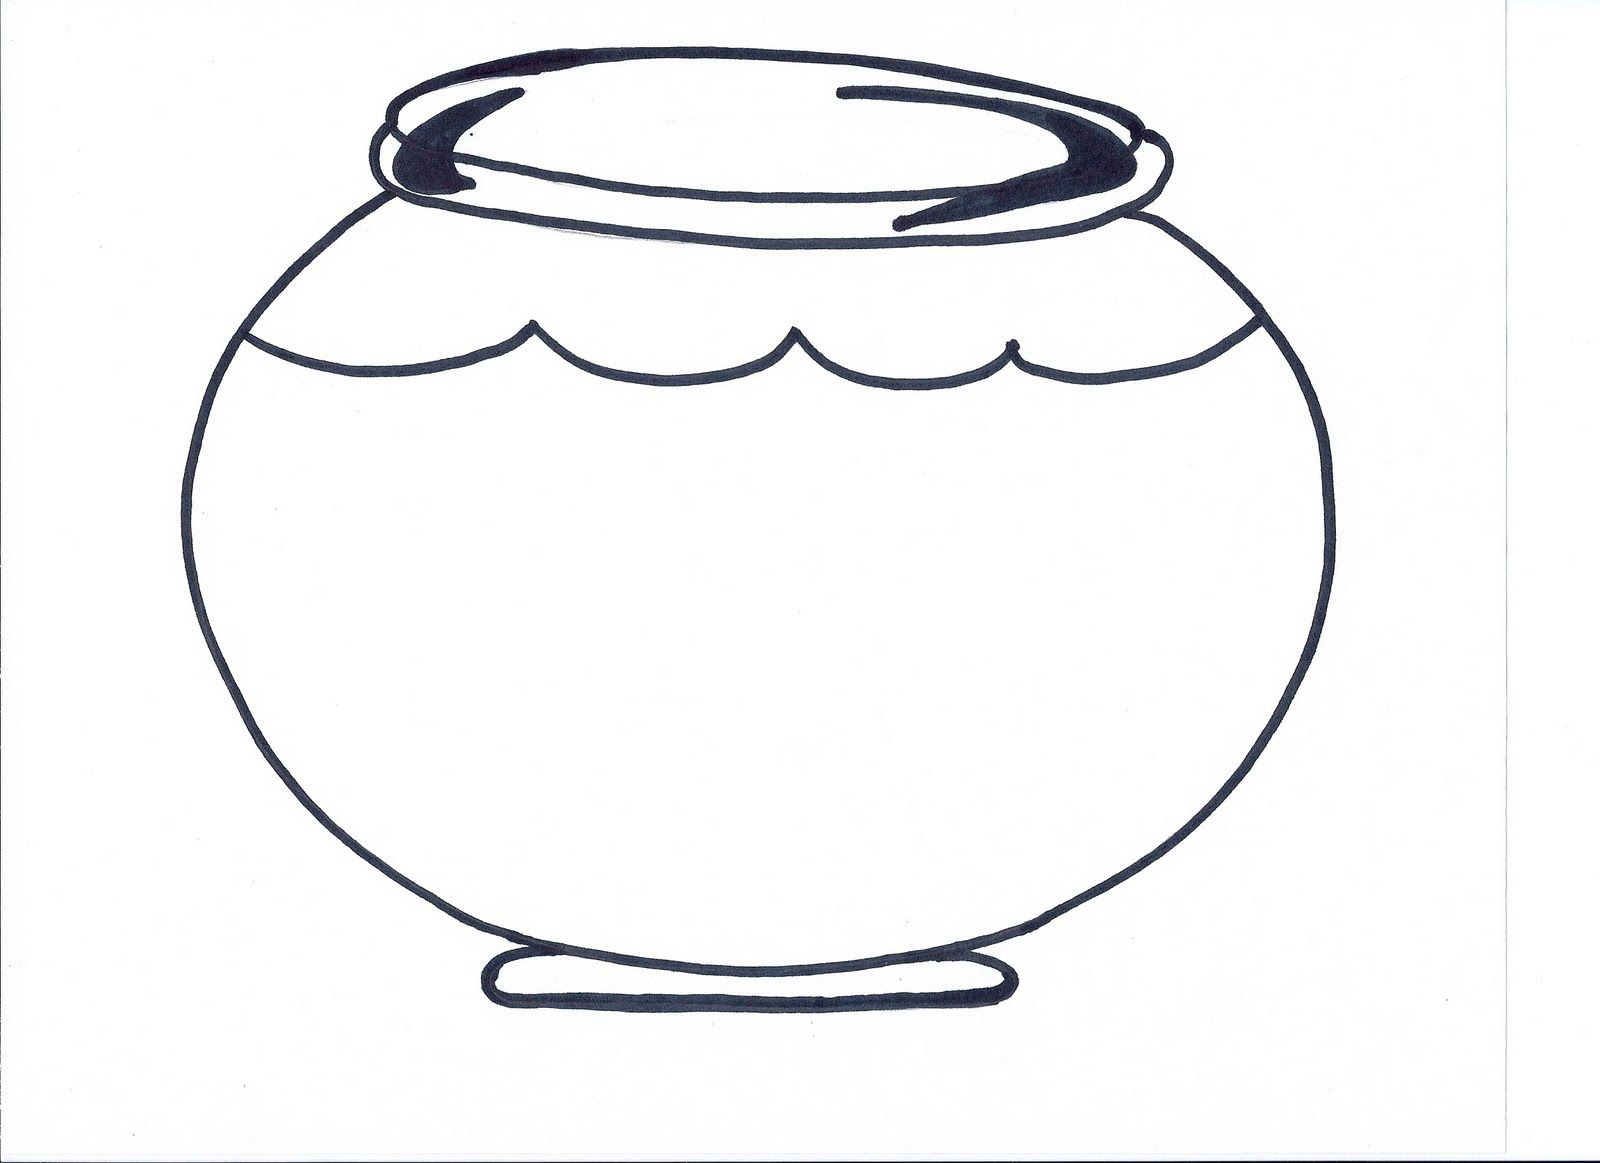 Dr.+Seuss+Fish+Bowl+Printable.